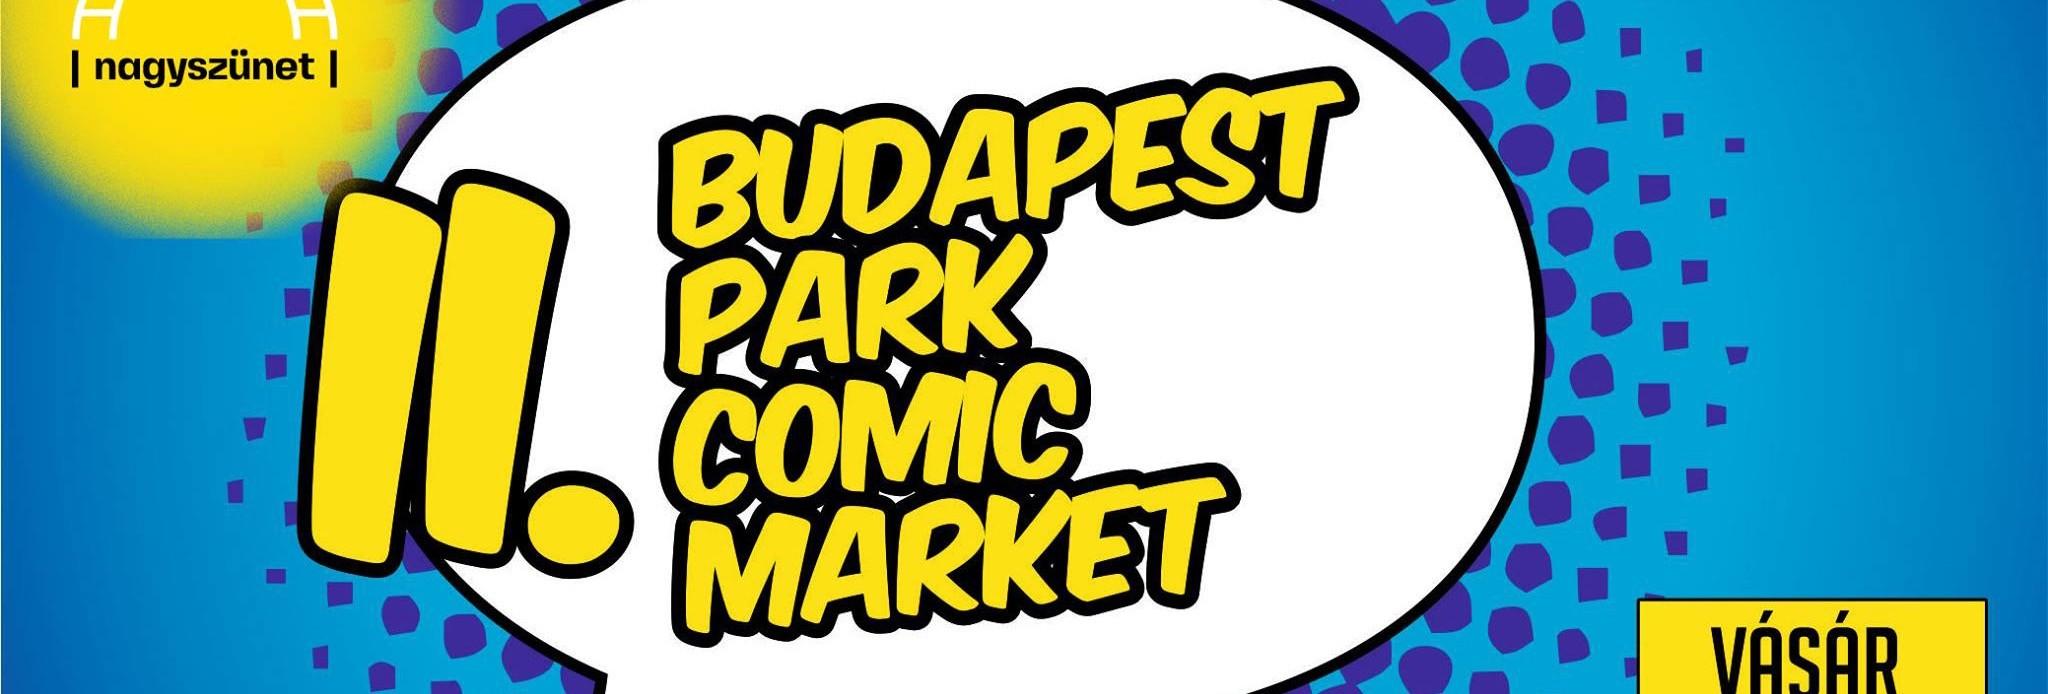 Comic Market - Budapest Park